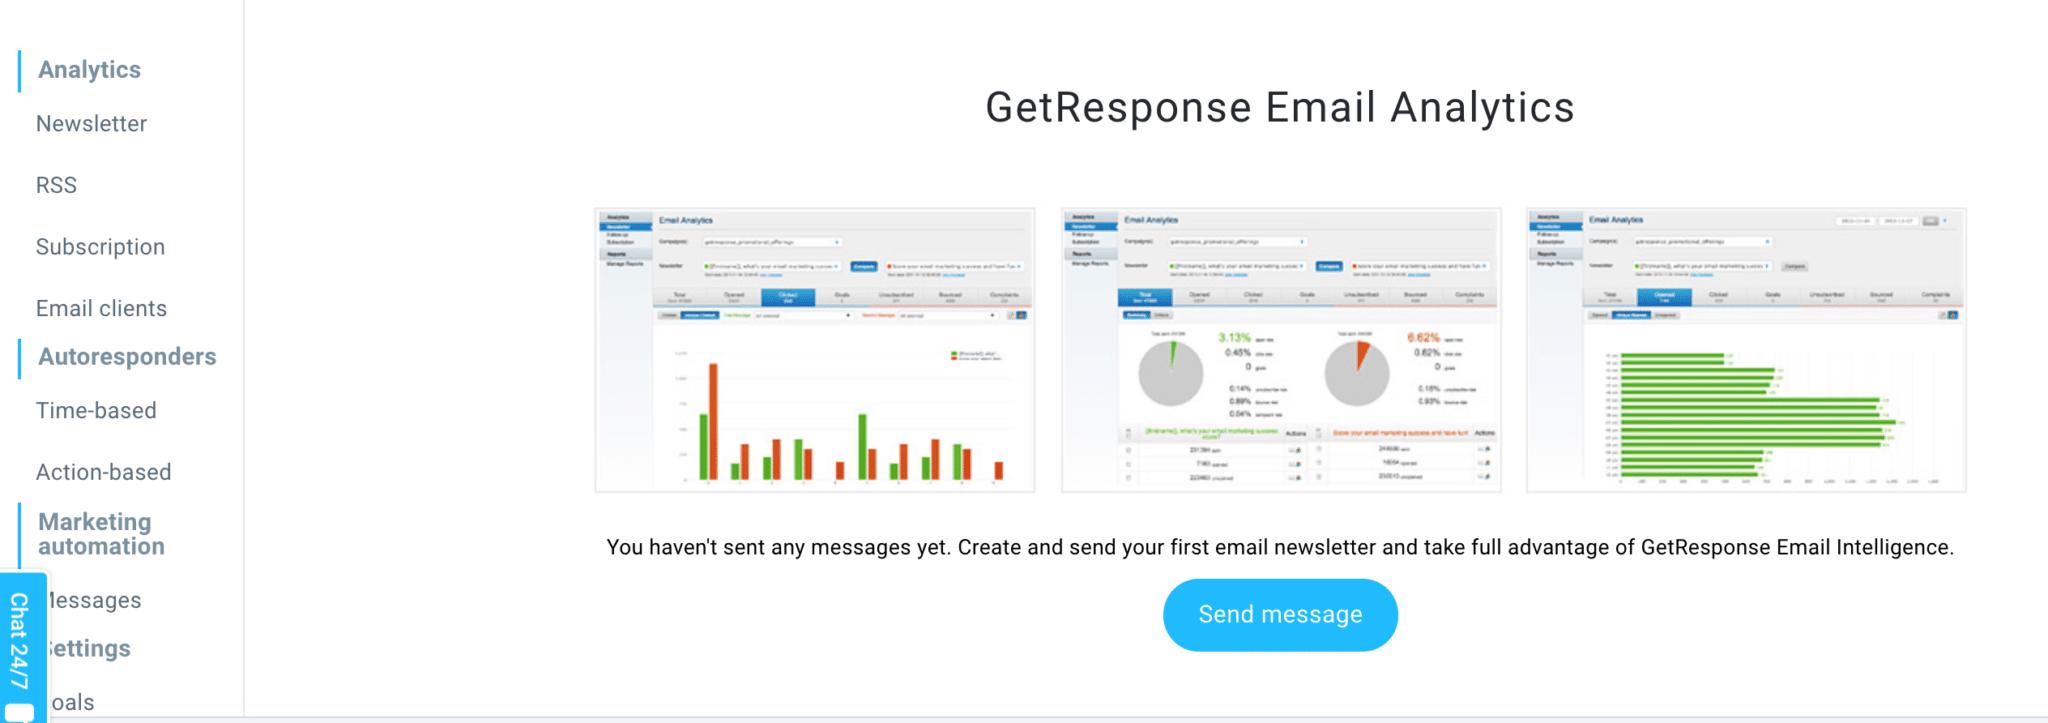 GetResponse Reporting